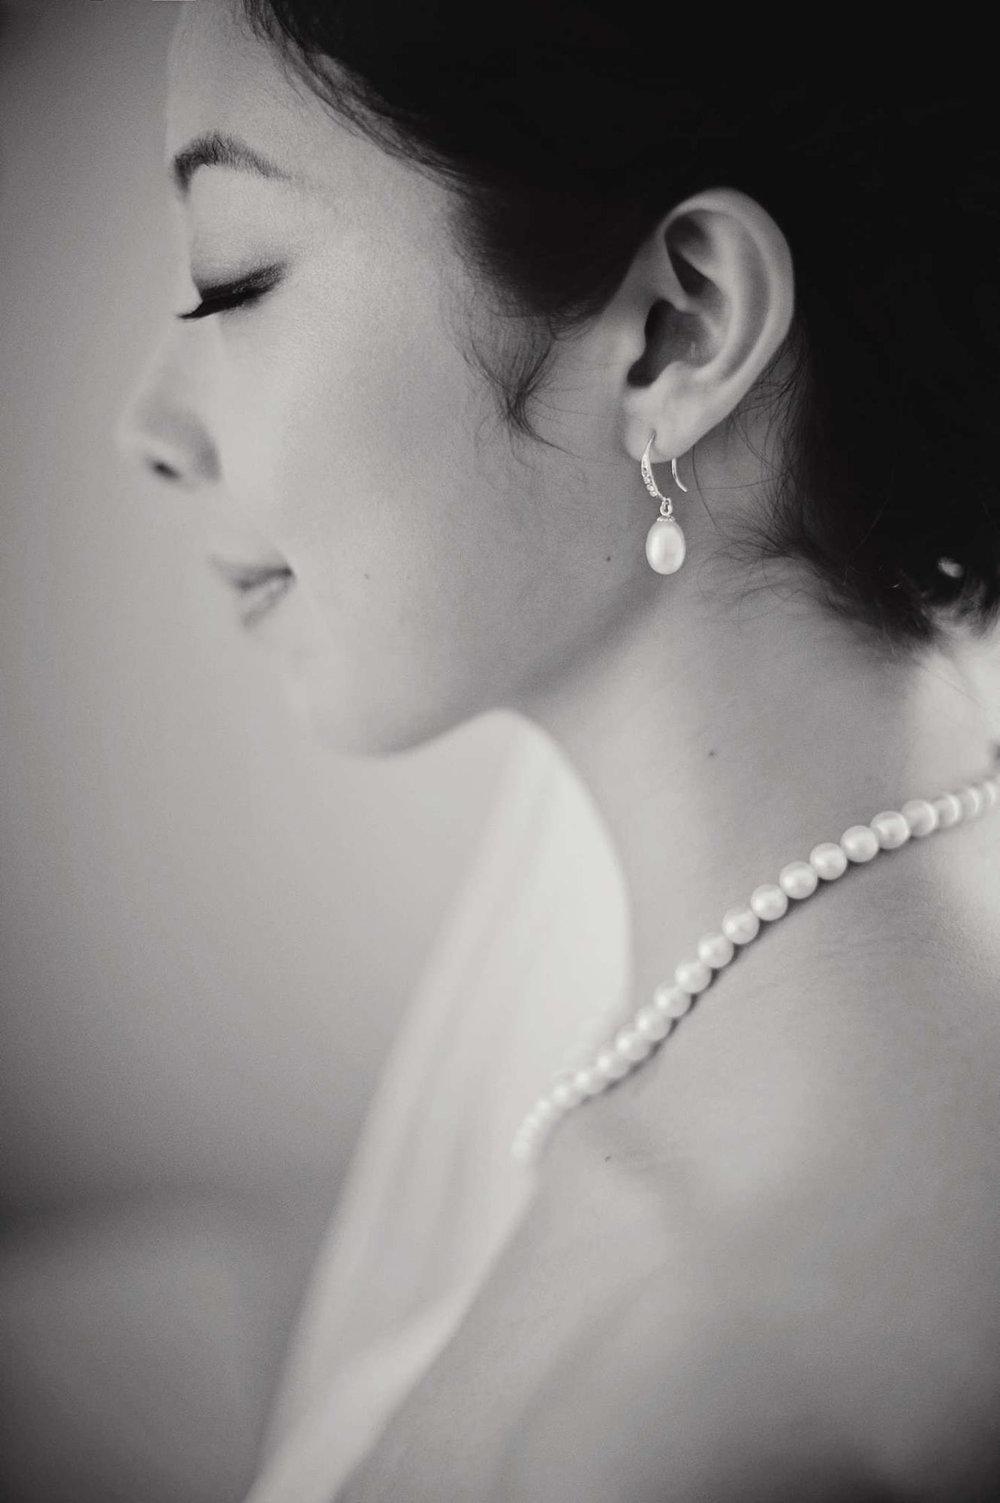 Chris_Hui_婚禮_婚紗照_pre_wedding_photography_best_065_.jpg